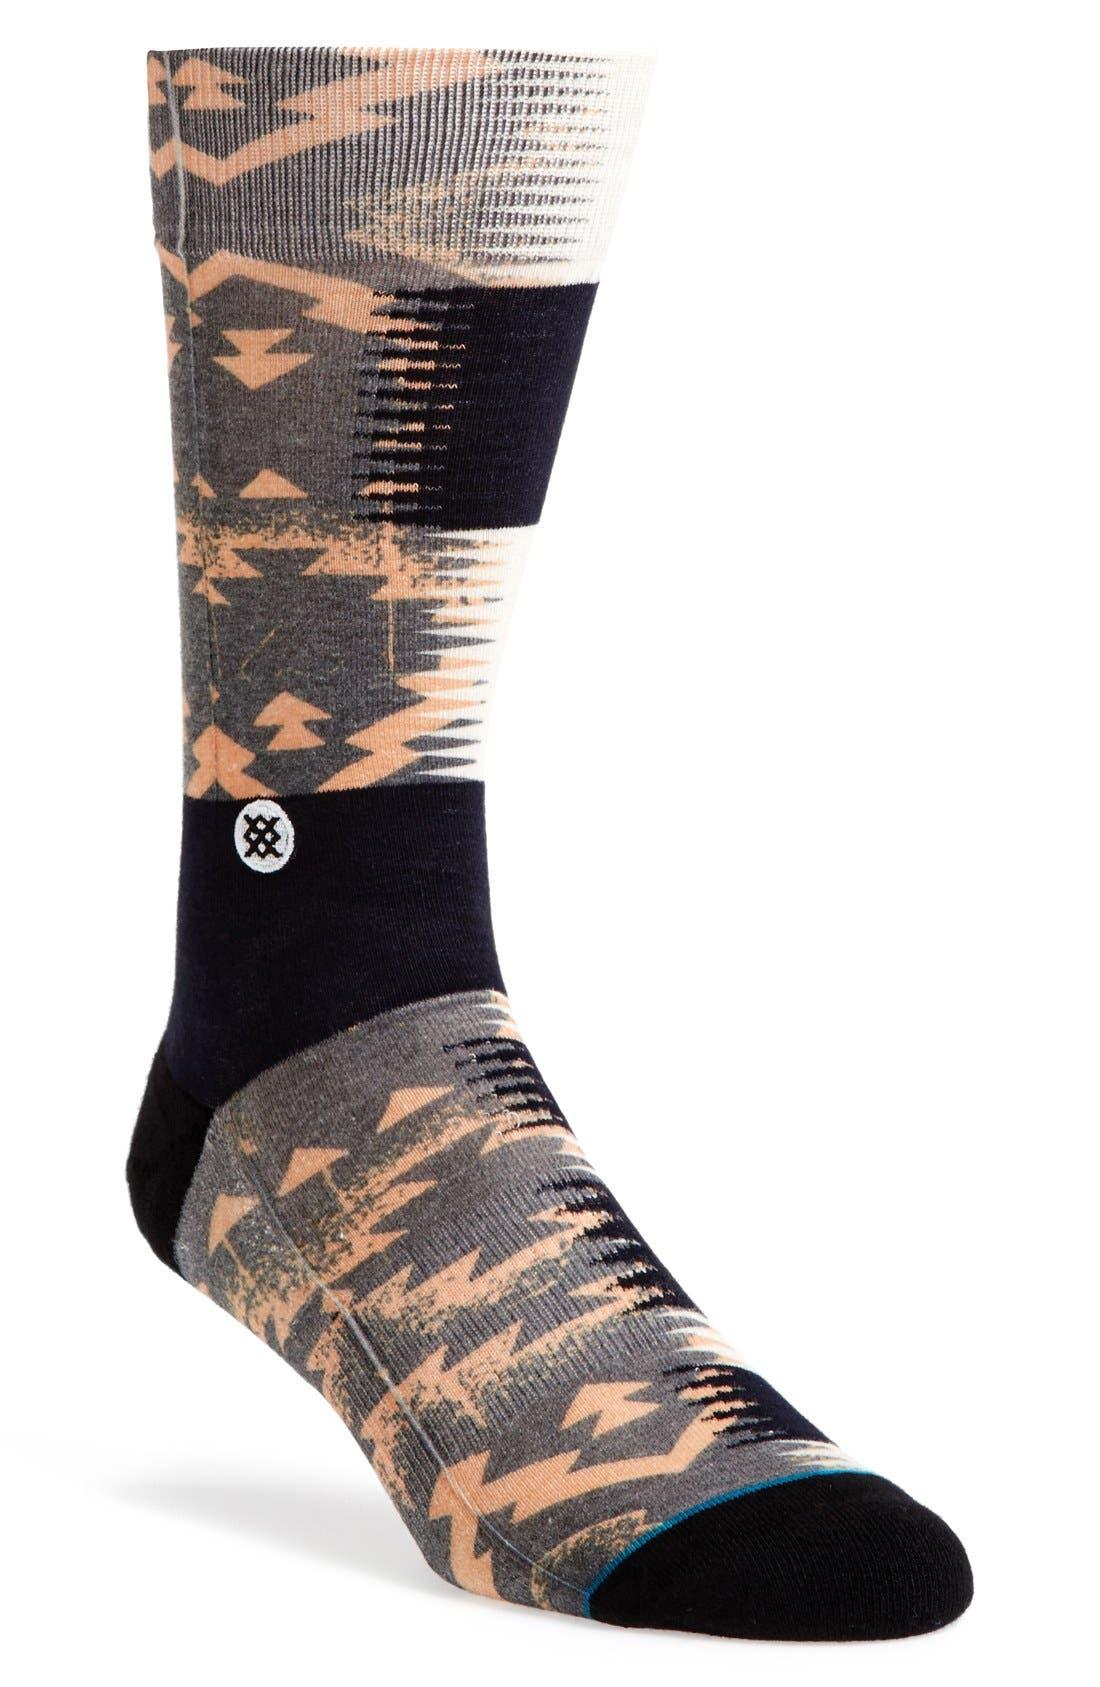 Alternate Image 1 Selected - Stance 'Maxwell' Socks